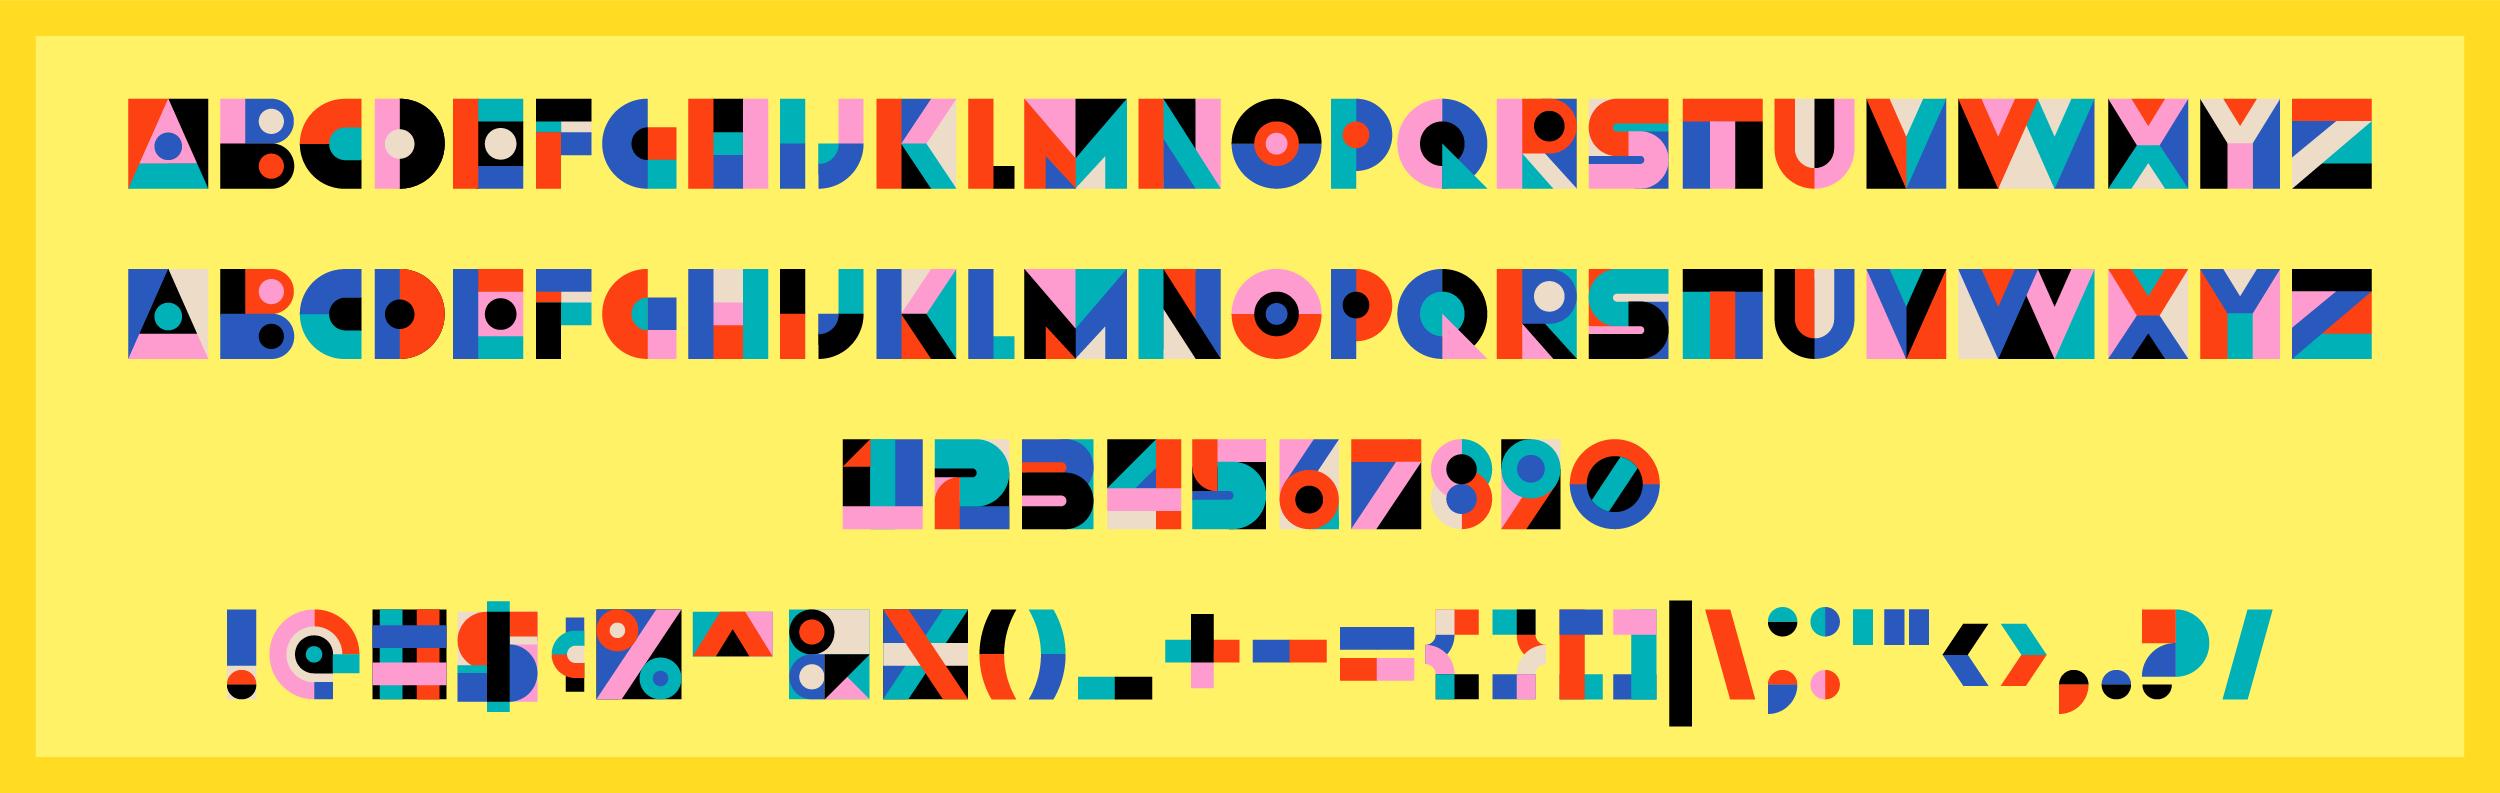 Fonts lol | Blockino